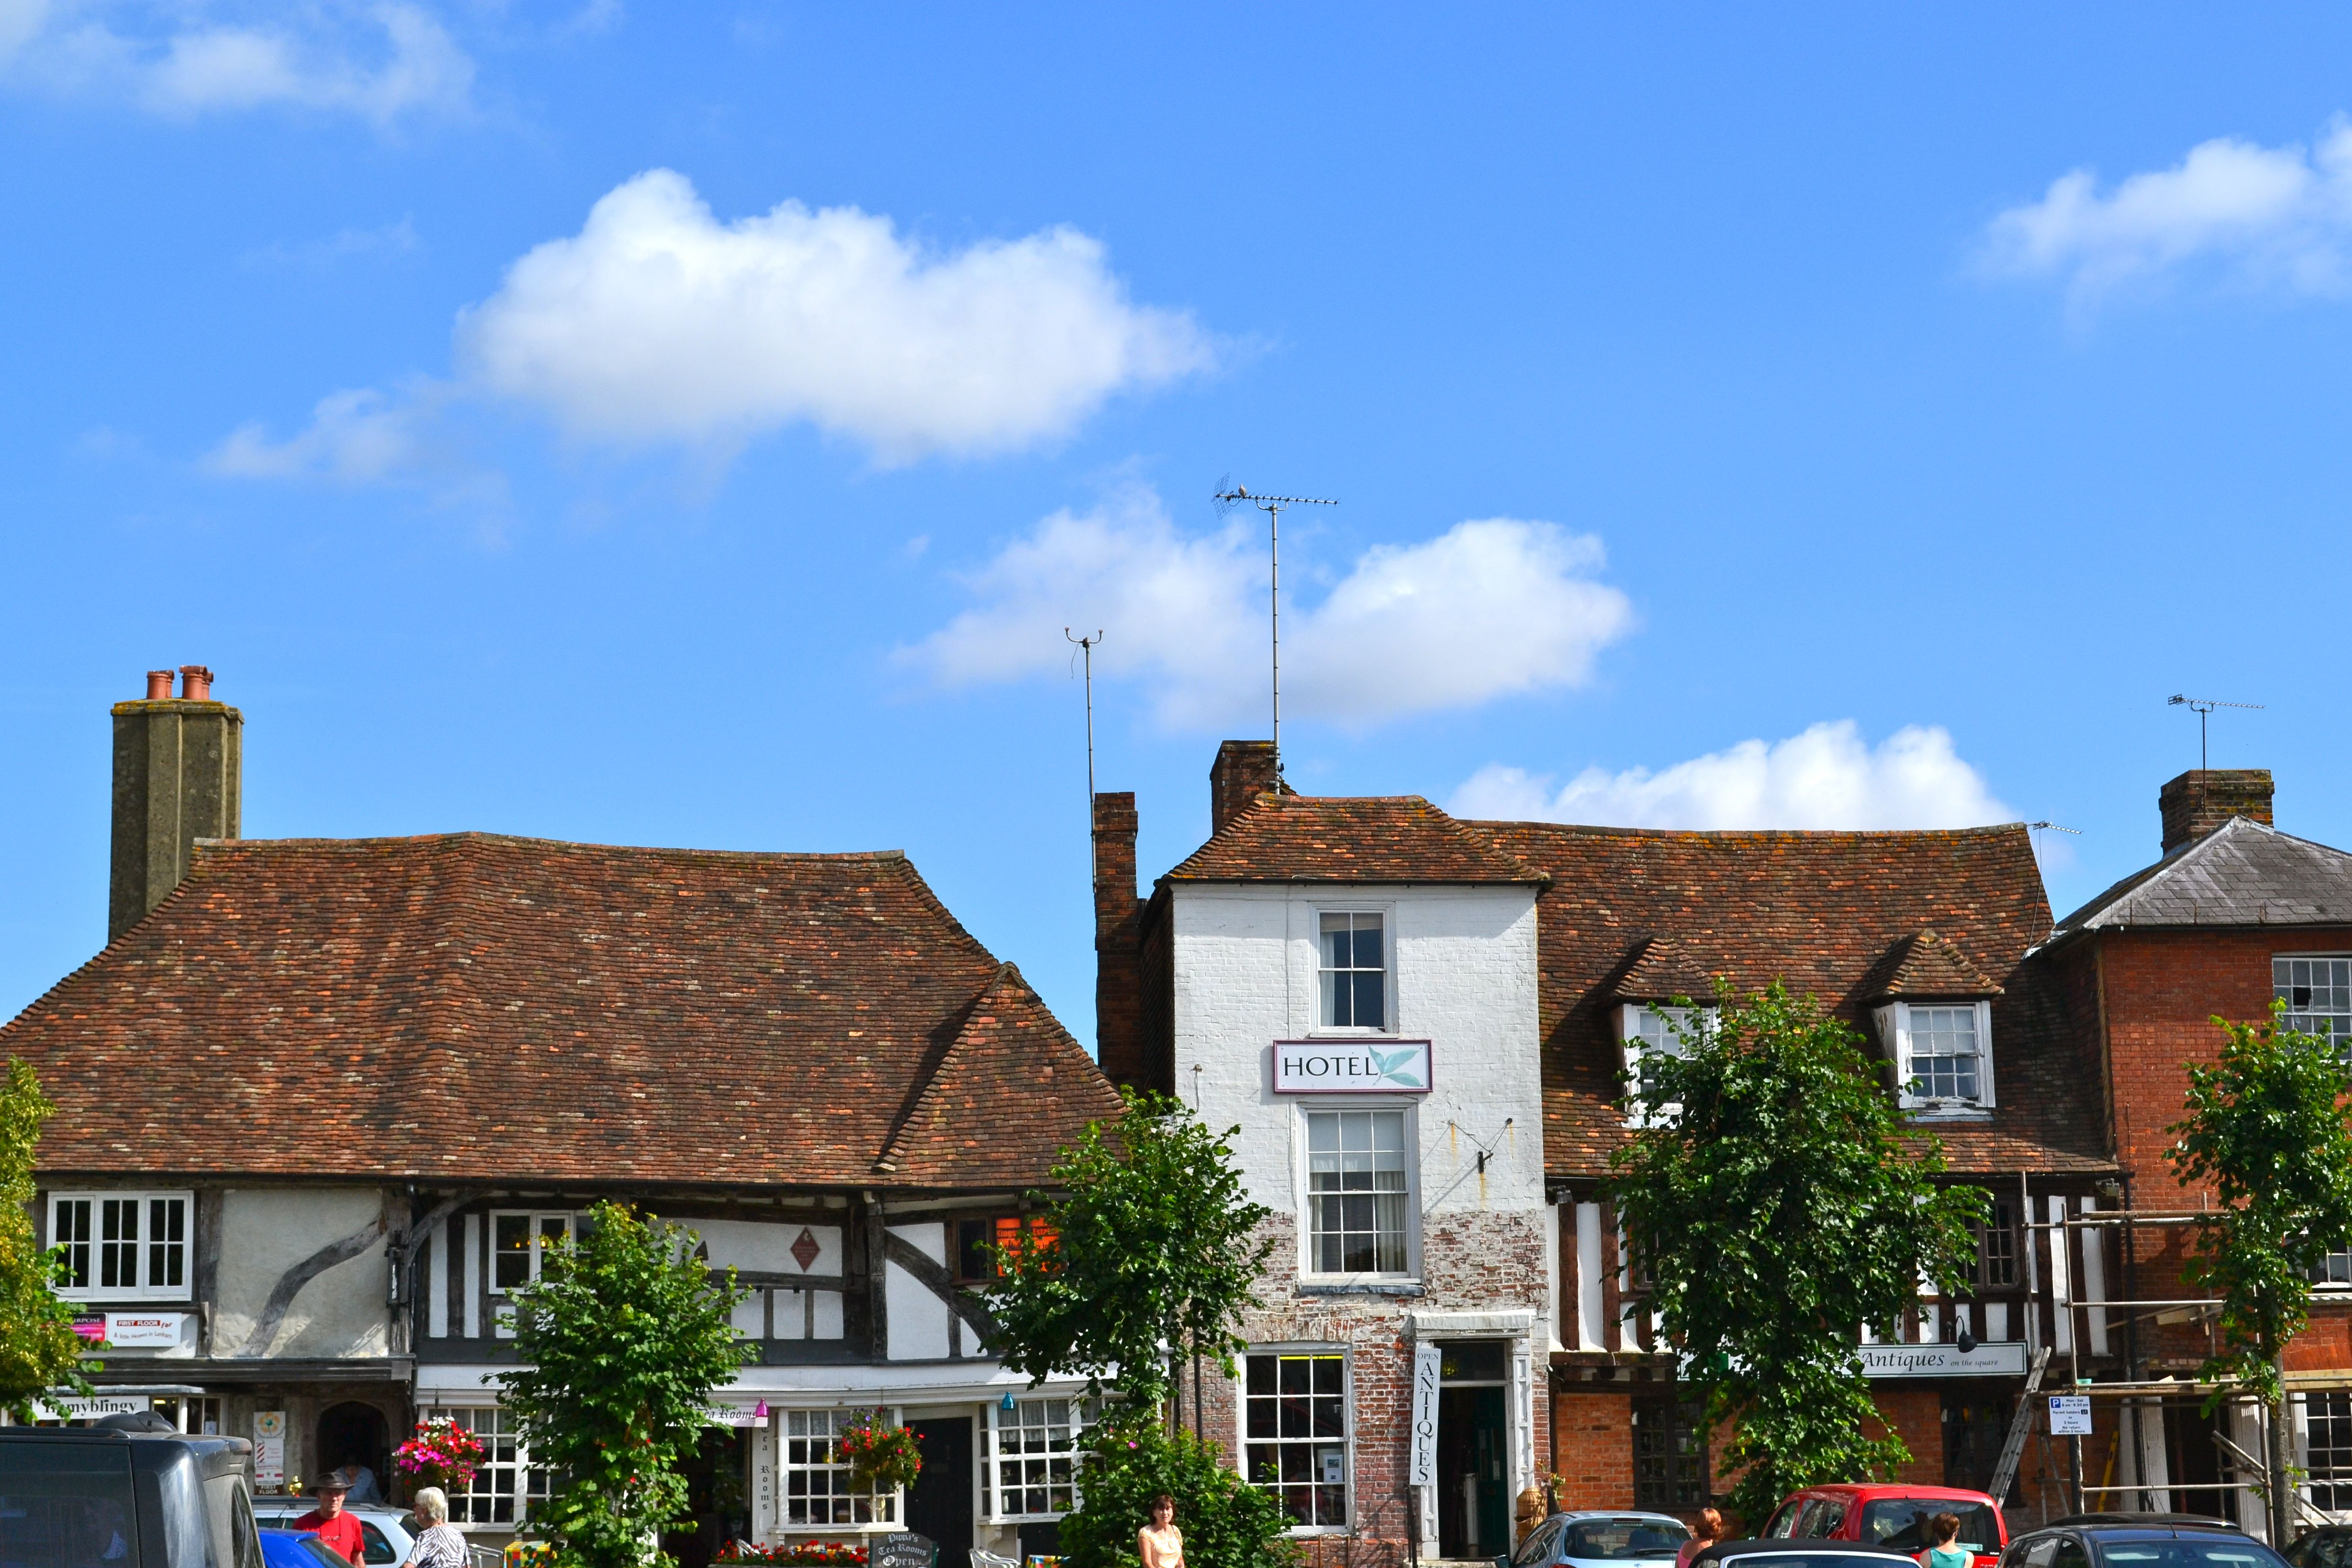 The village of Lenham in the borough of Maidstone, Kent